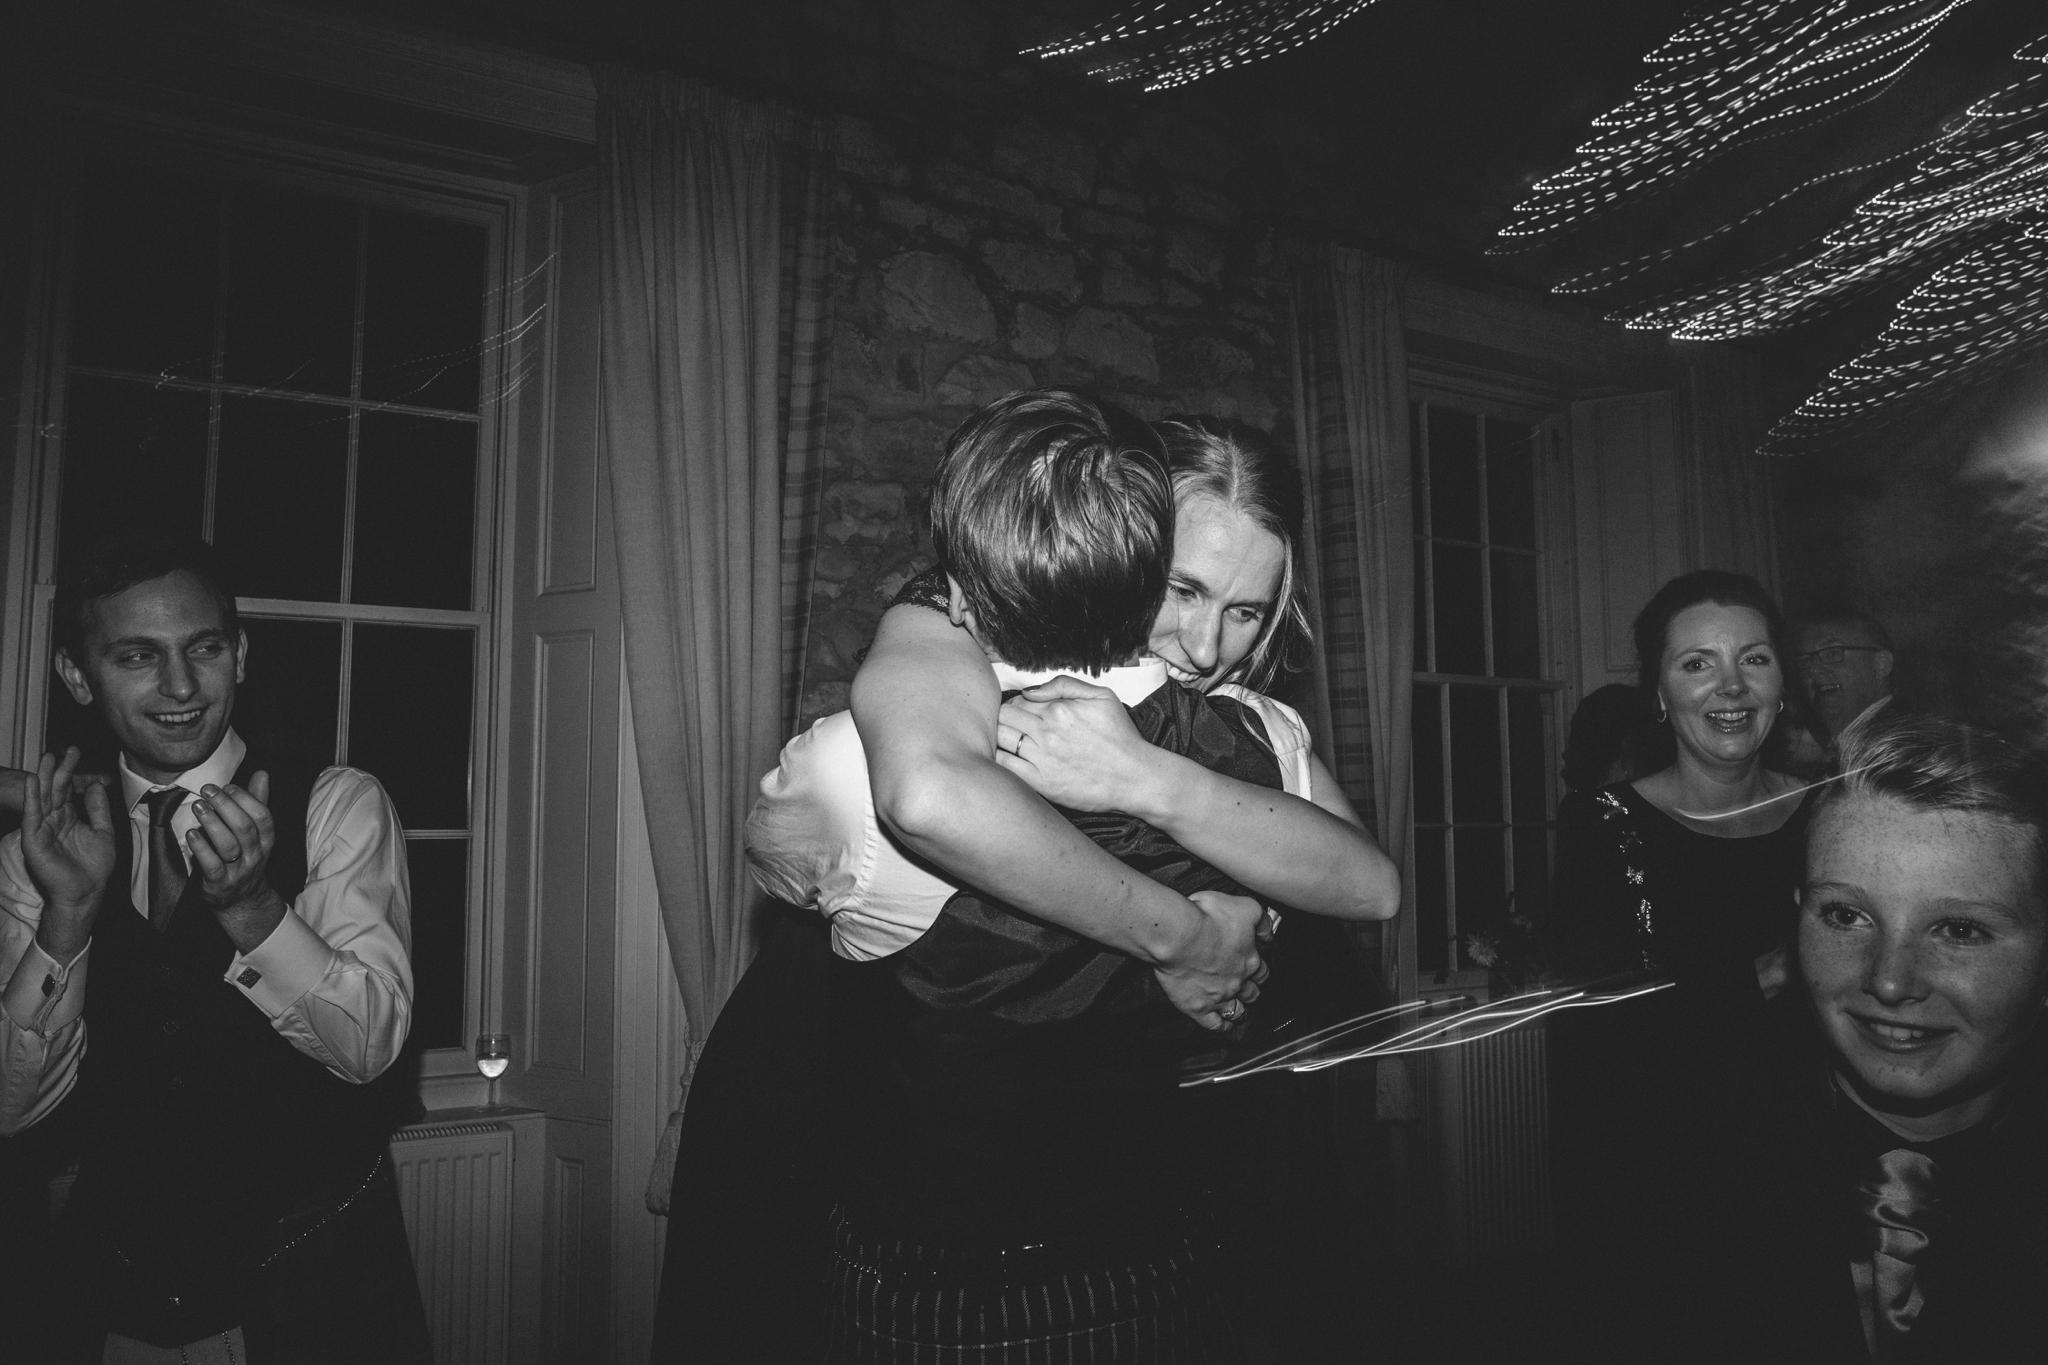 Suzanne_li_photography_kirknewton_wedding_0075.jpg